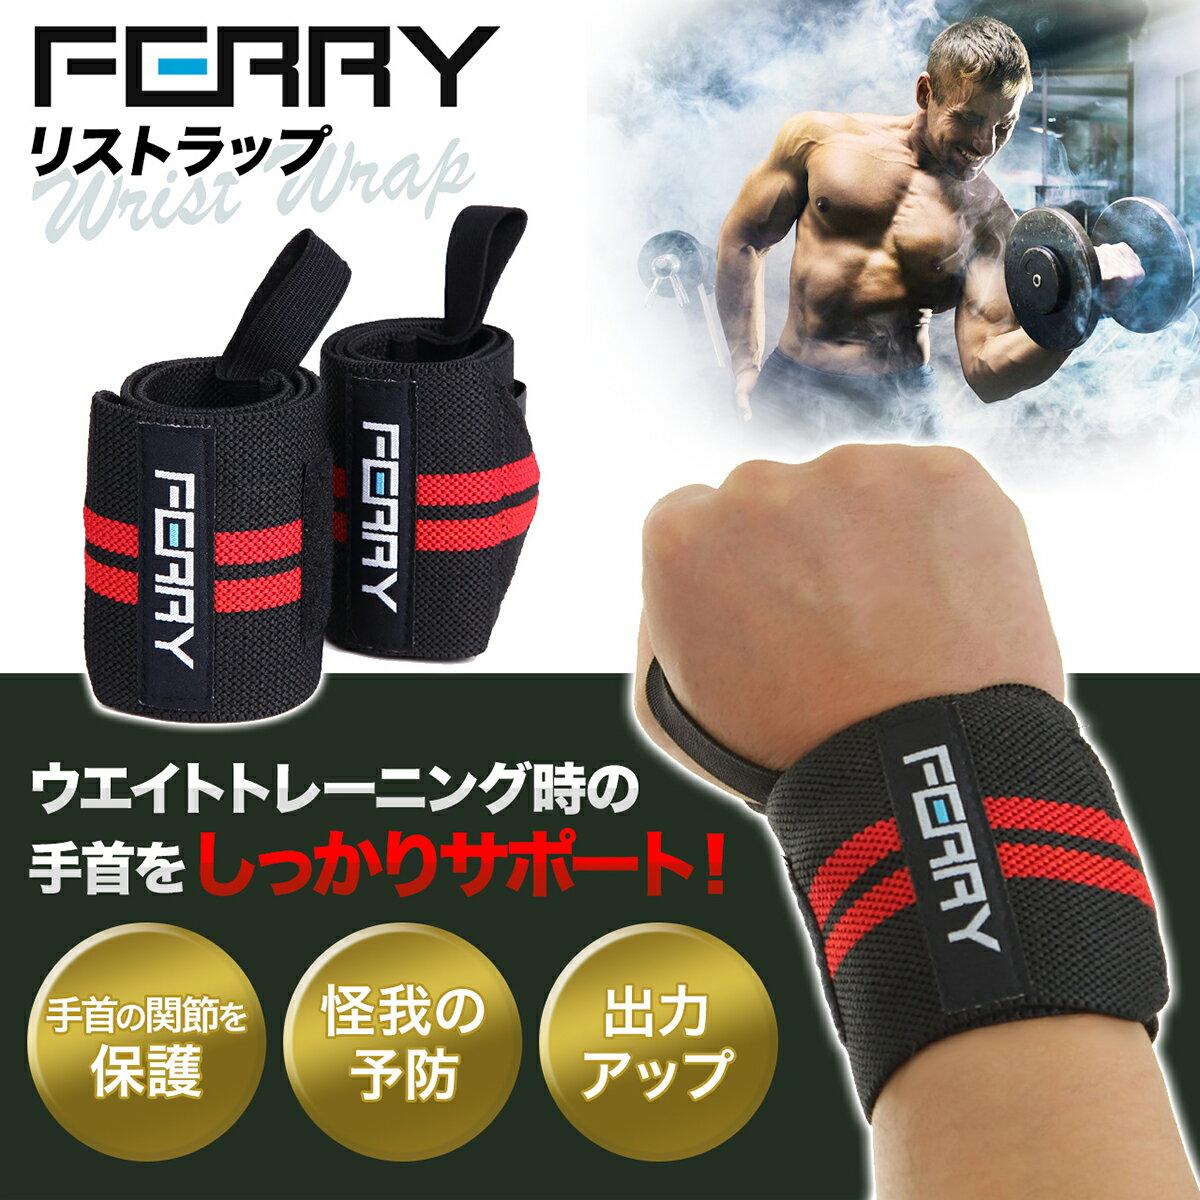 FERRY リストラップ ウエイトトレーニング 手首固定 (2枚組) 4カラー